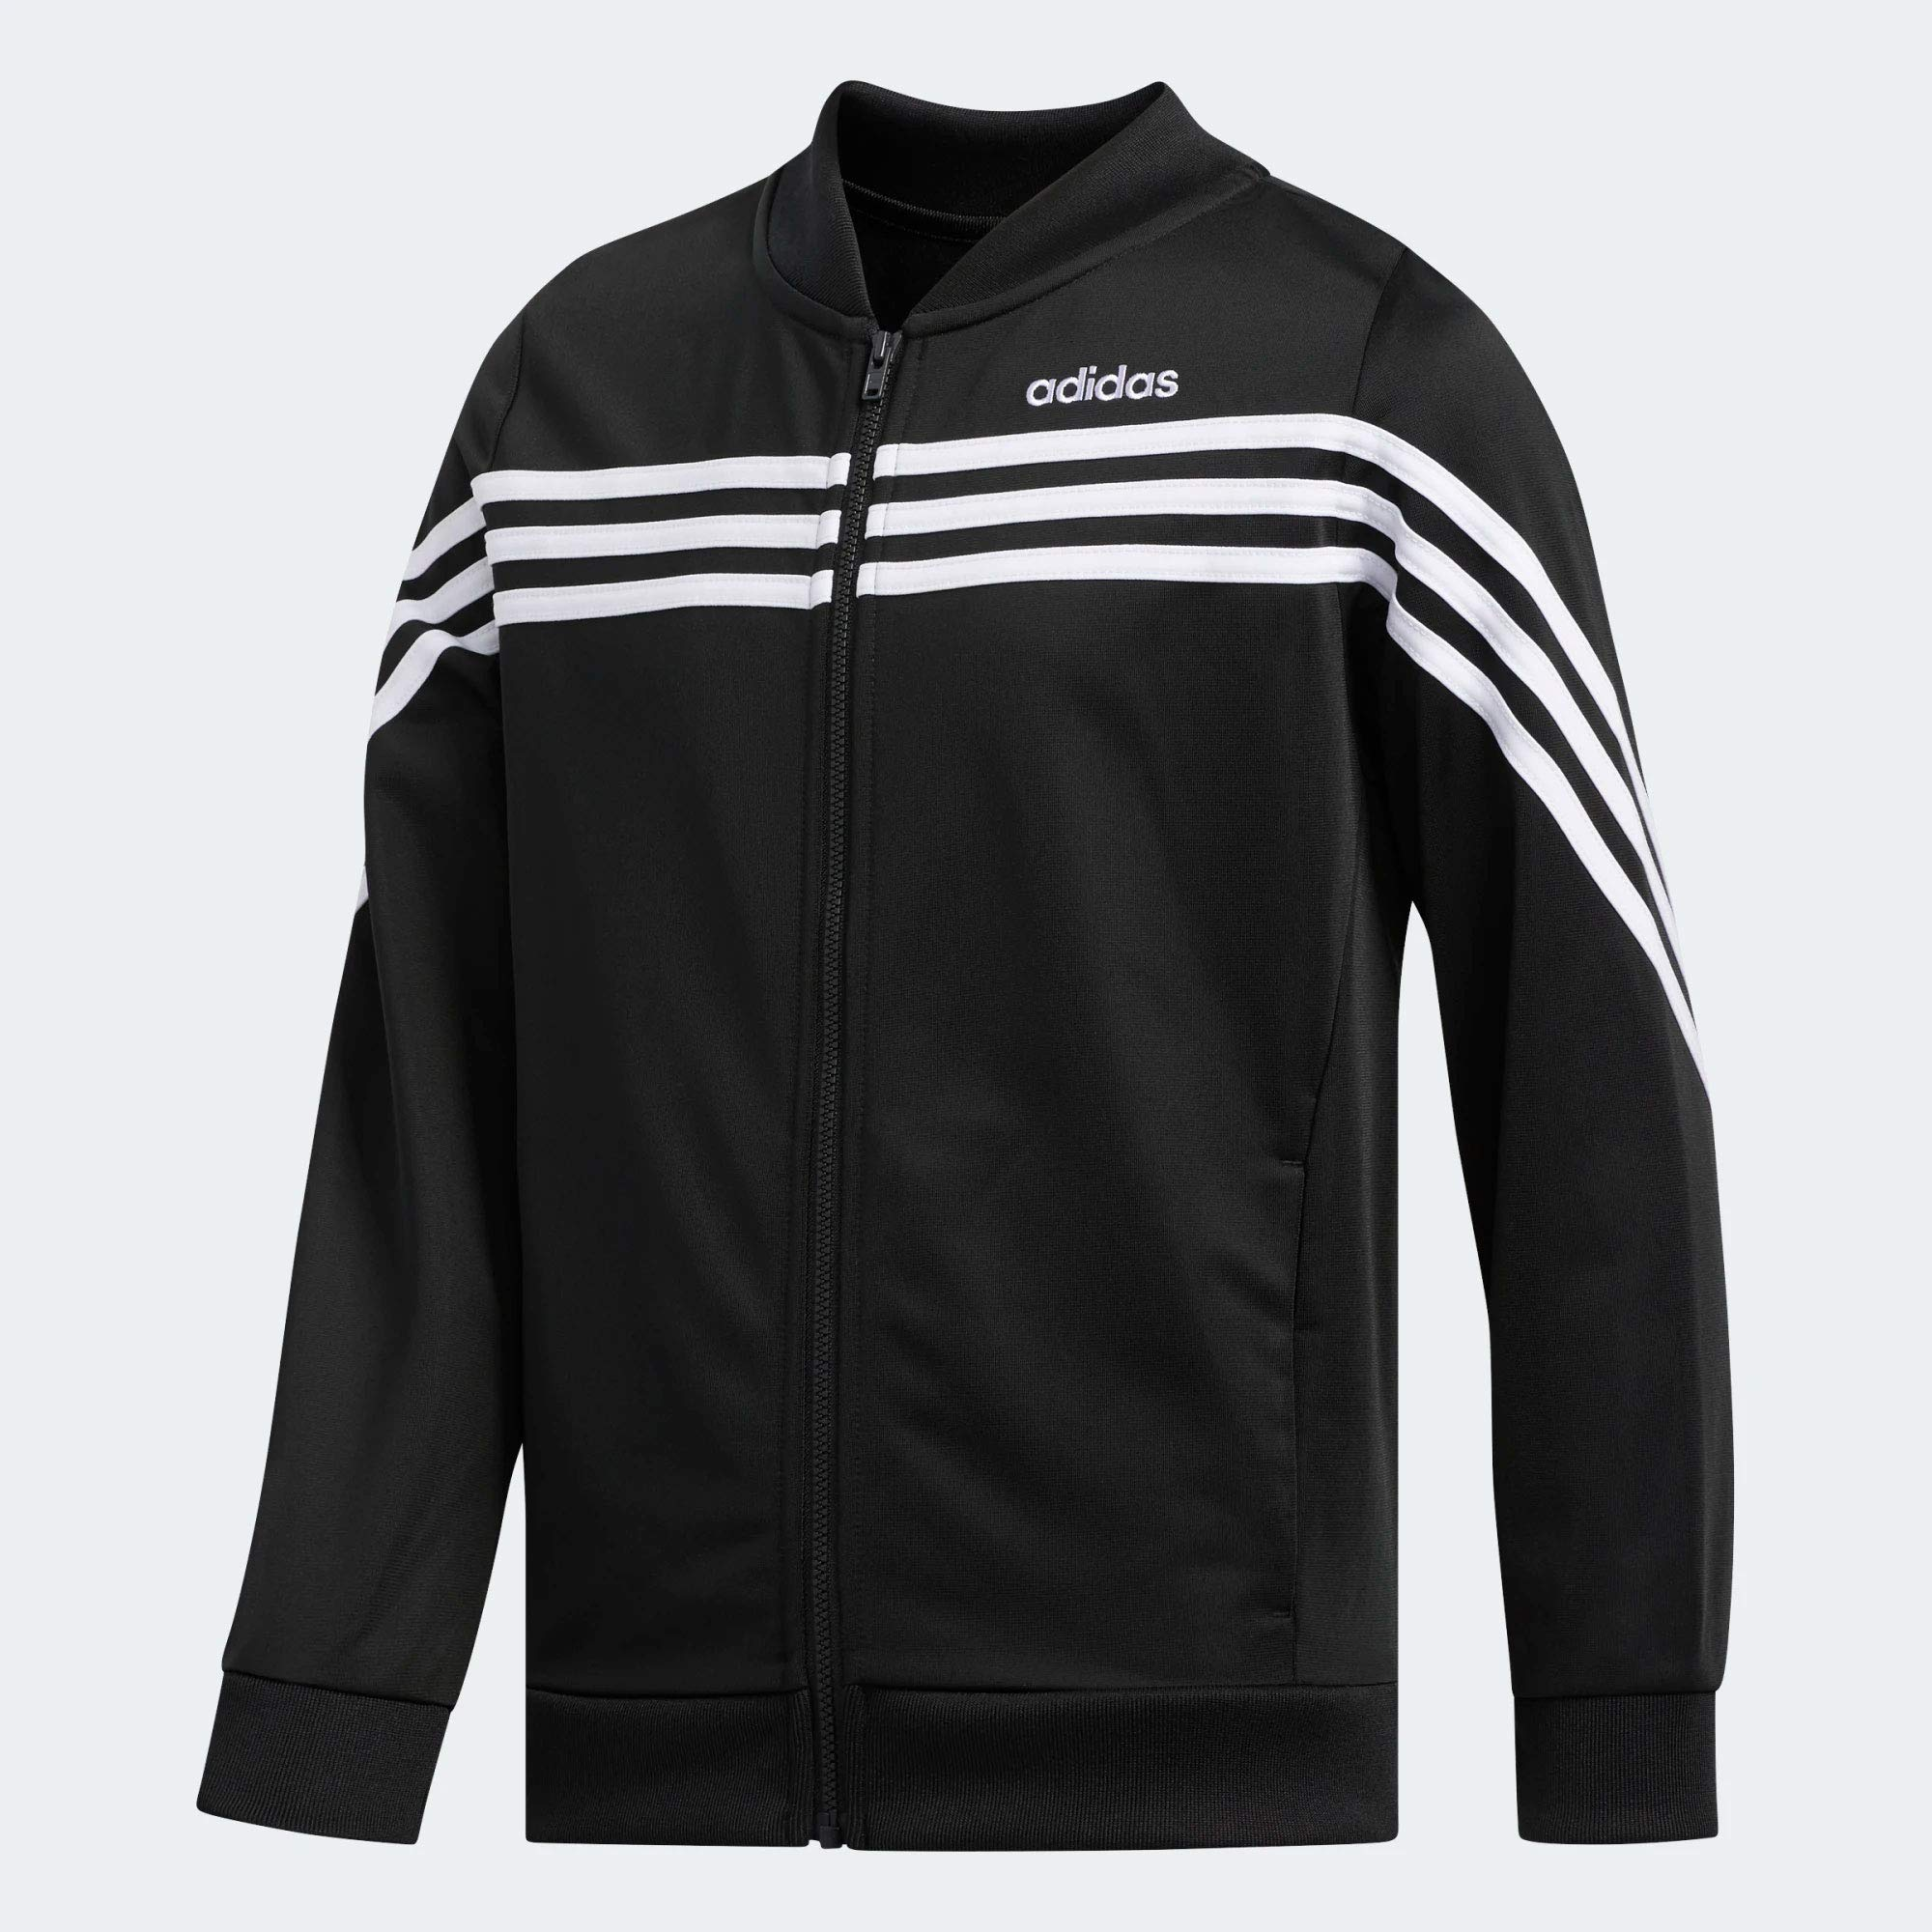 adidas Girls' Track Jacket (S (7/8), Black/White Linear) by adidas